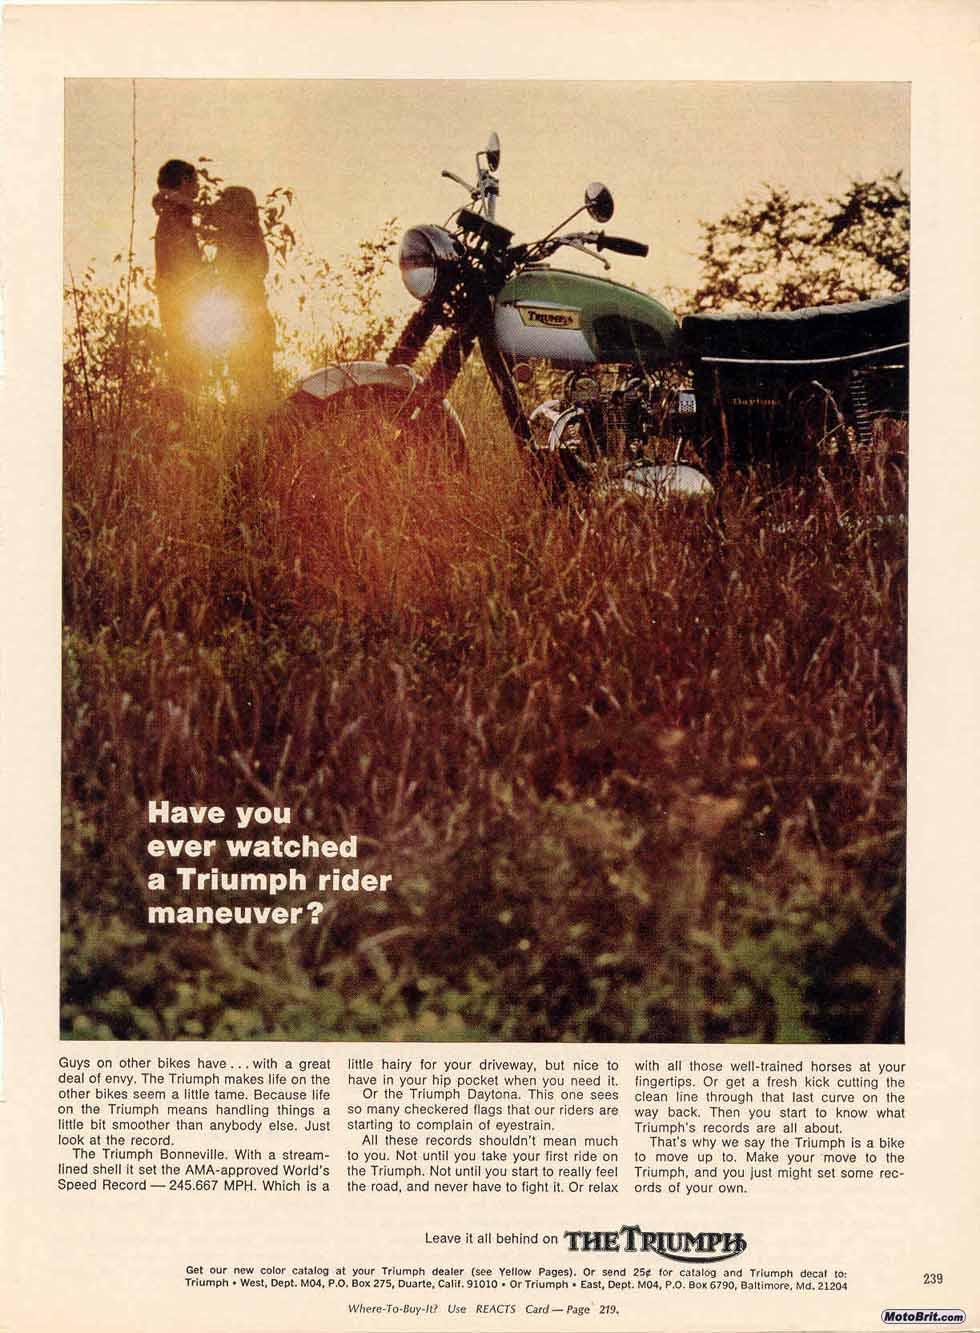 1969 Triumph Daytona 500